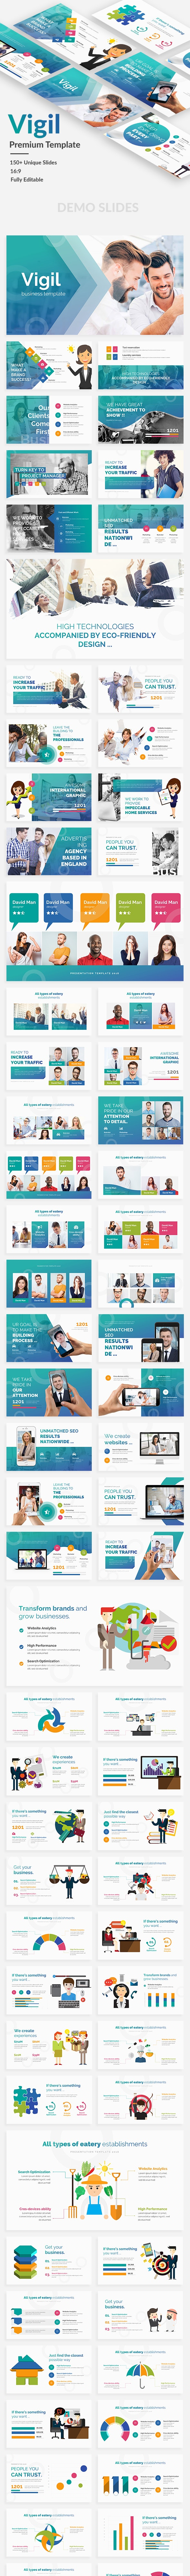 Vigil Business Premium Google Slide Template - Google Slides Presentation Templates